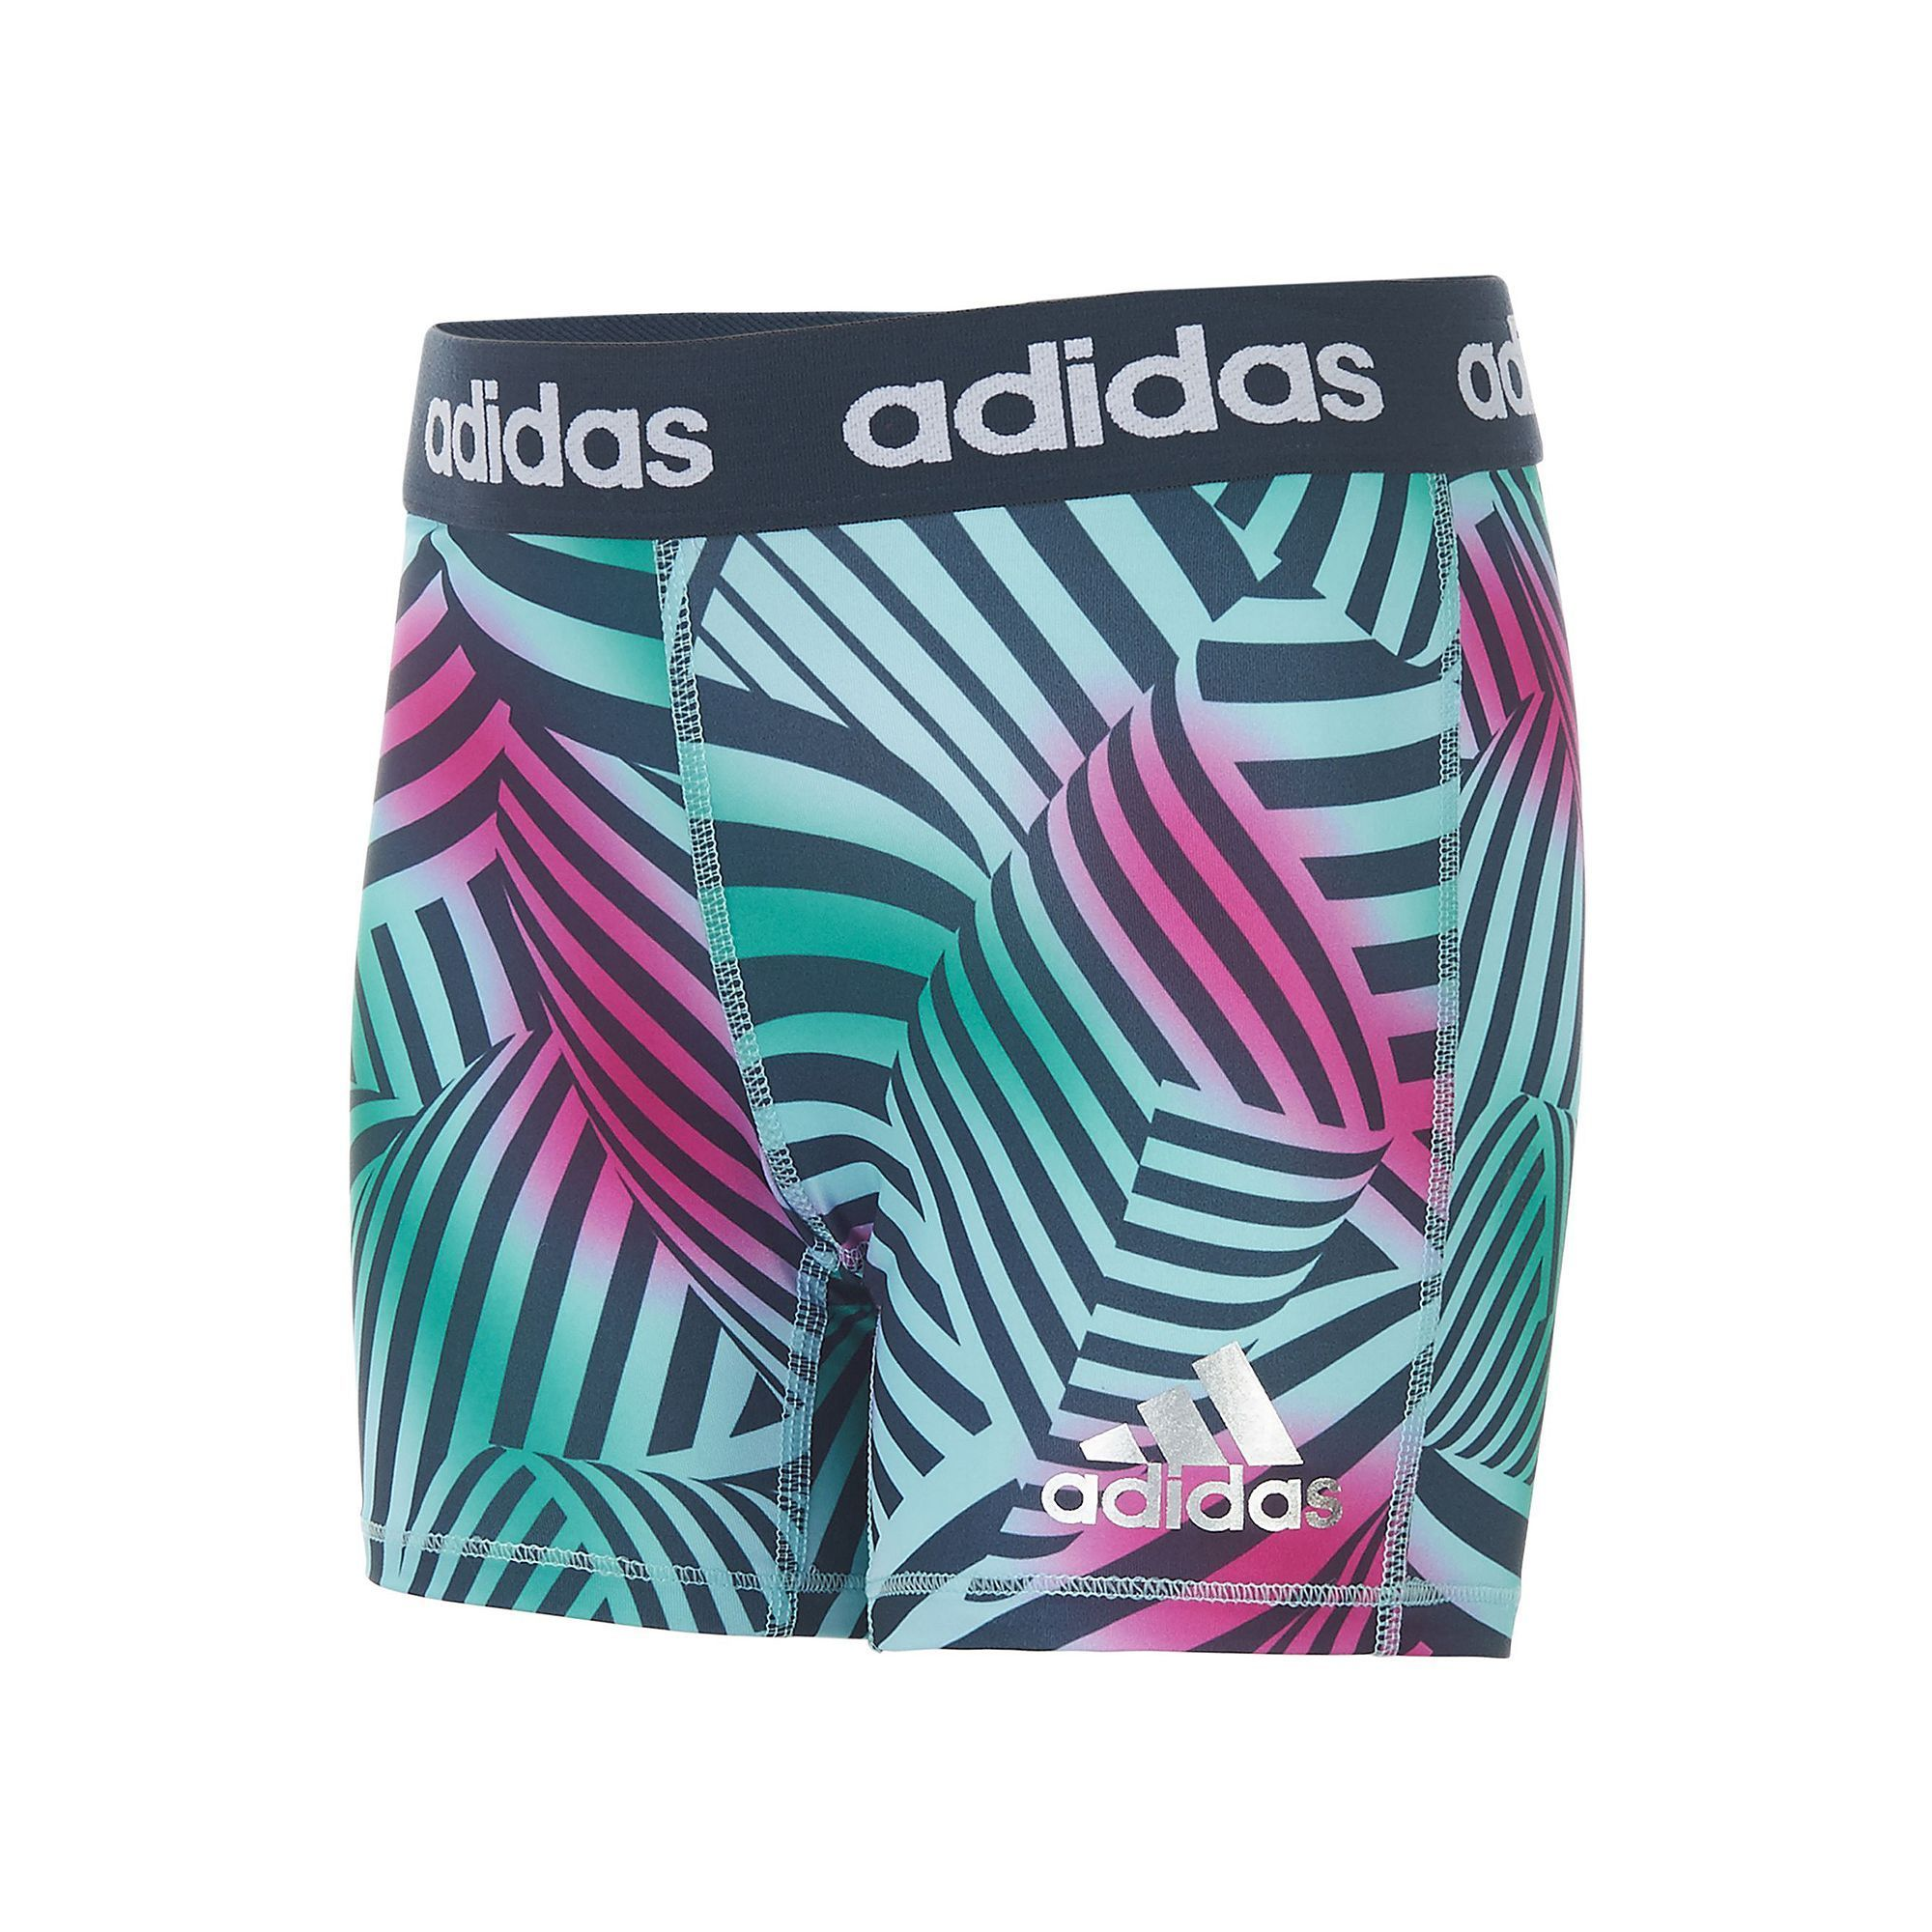 34208cc68a8 Girls 7-16 Adidas climalite Printed Tight Shorts, Girl's, Size: Medium,  Ovrfl Oth